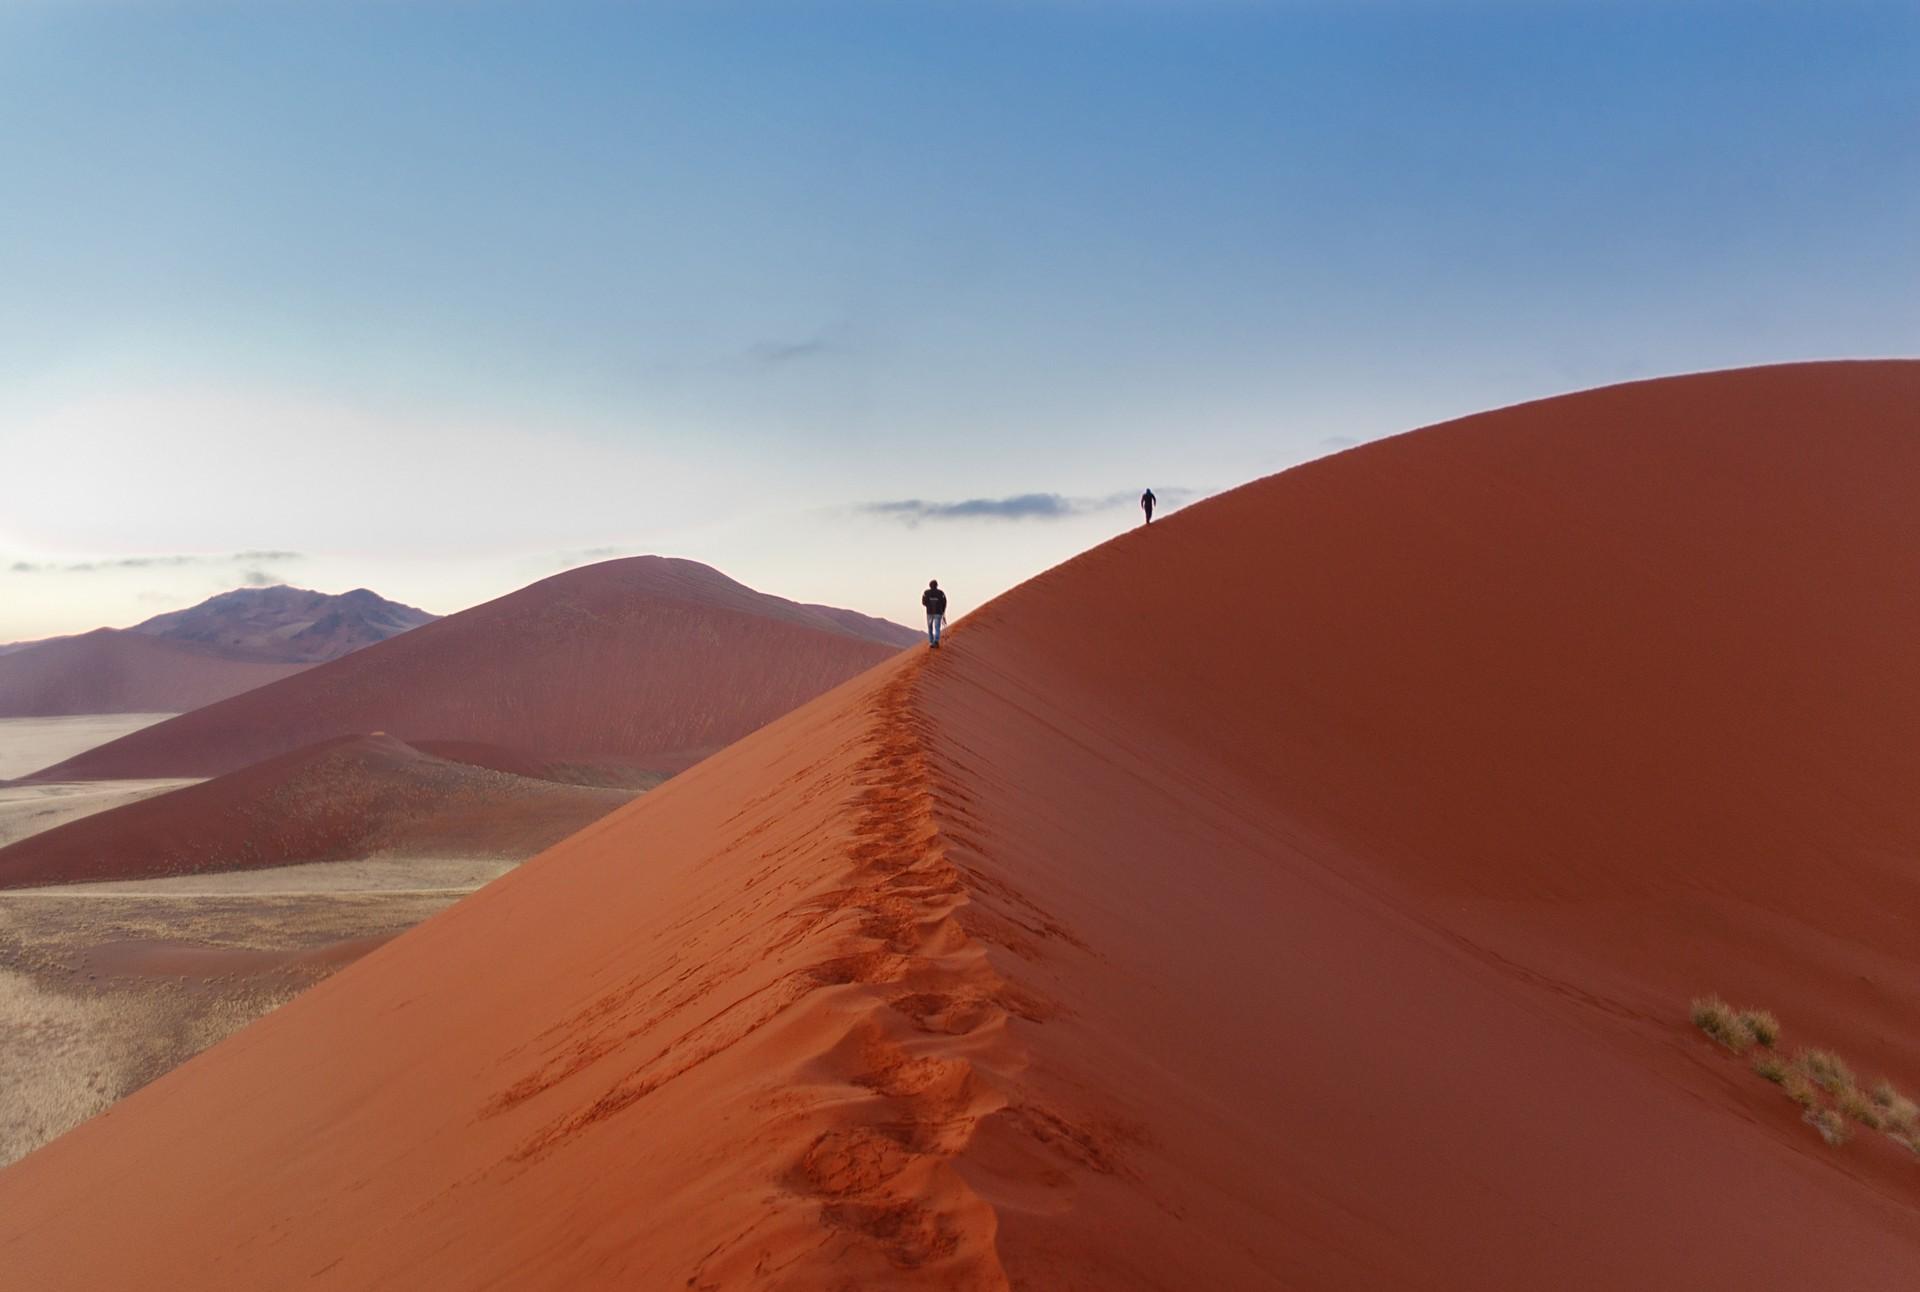 Sossusvlei landscape in Namibia